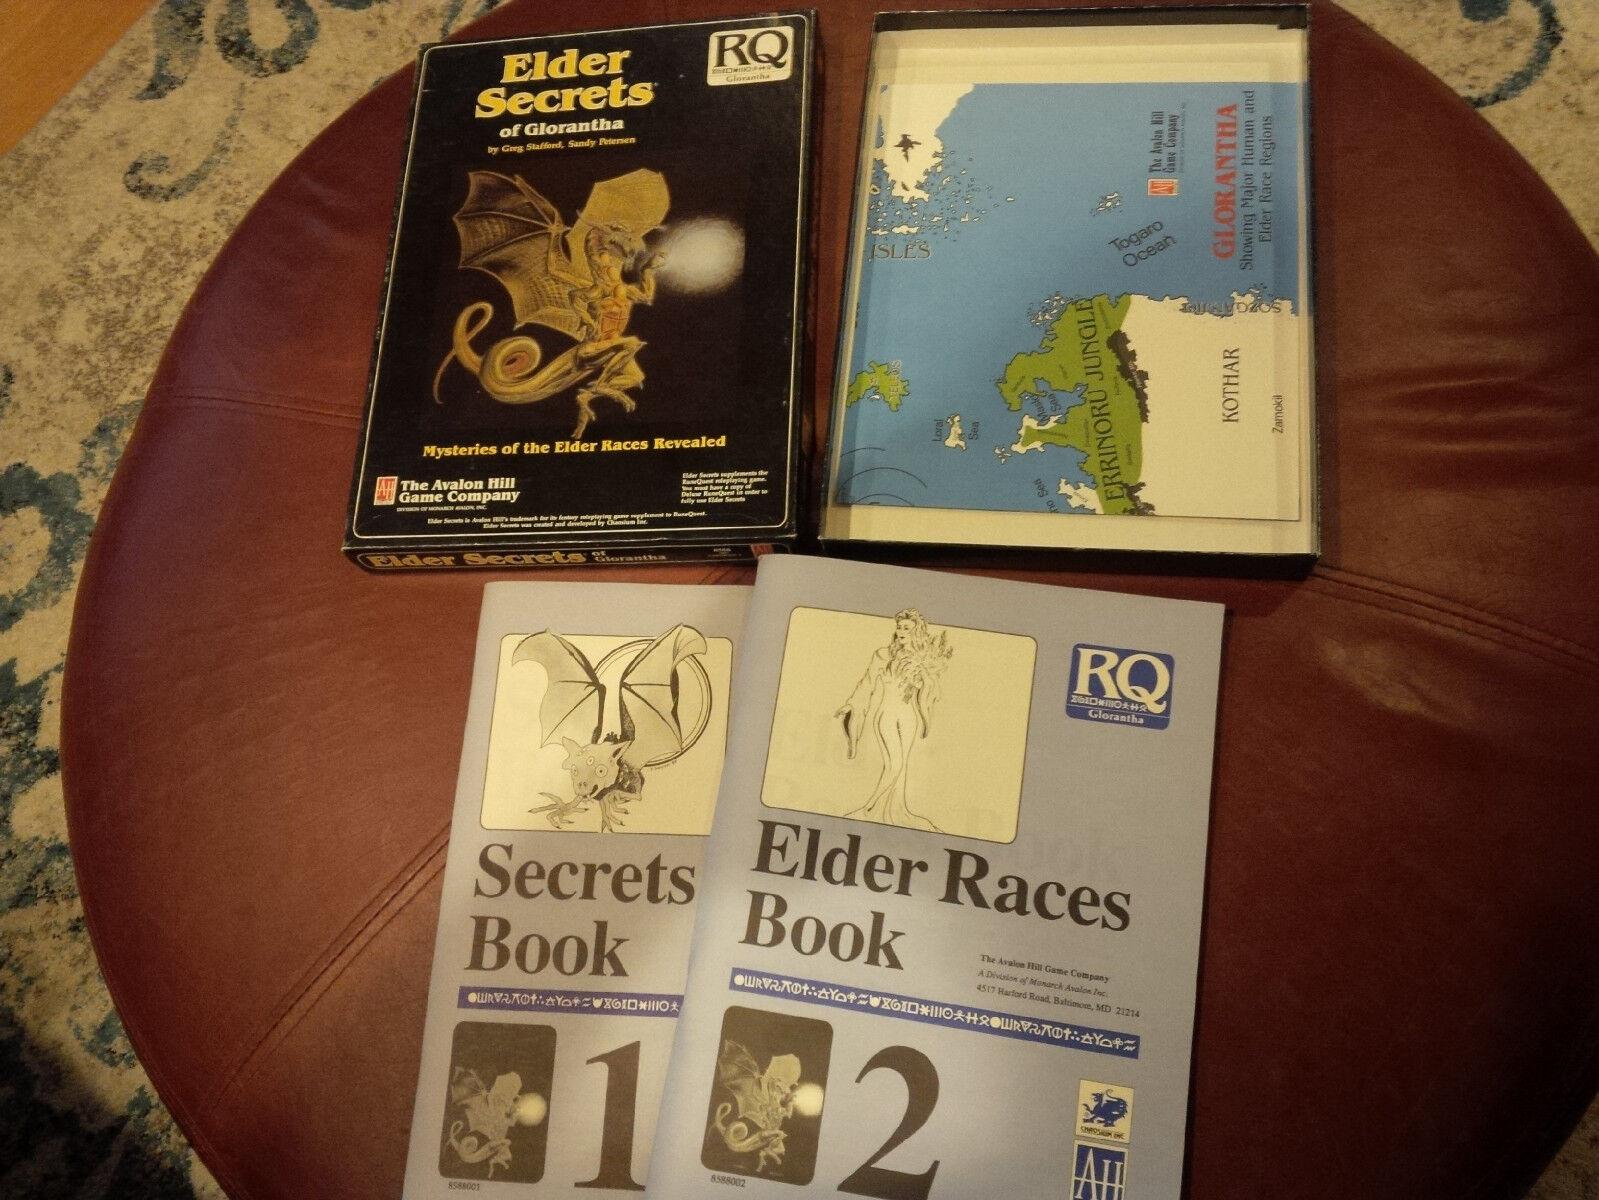 Elder Secrets of Glorantha Glorantha Glorantha runequest rpg box set avalon hill 7ea588